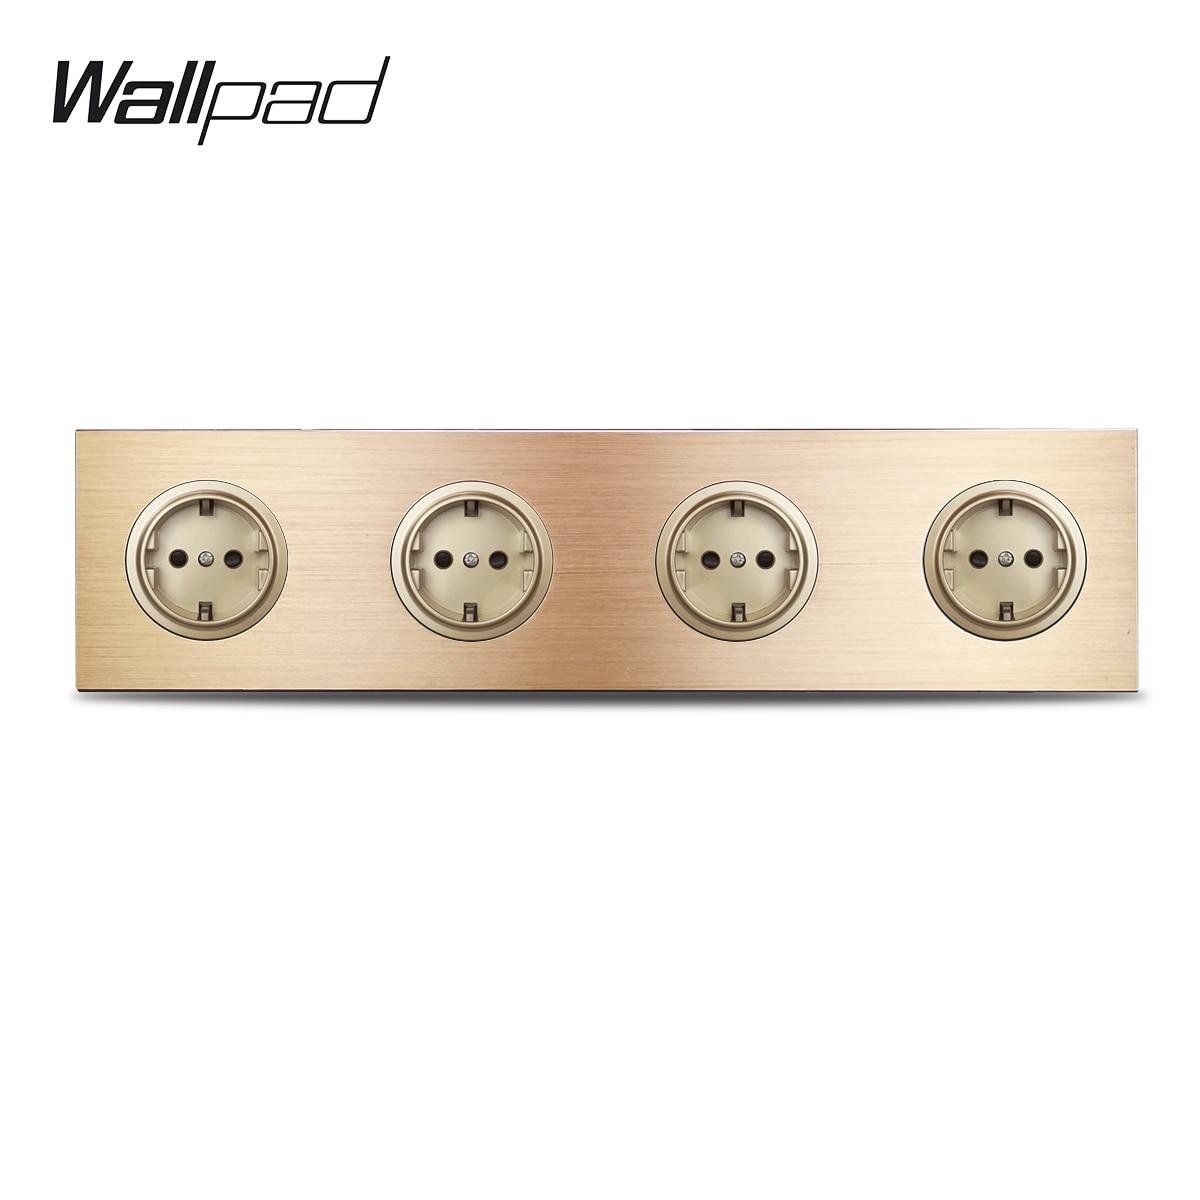 Wallpad L6 الذهب الرباعي 4 طريقة الألمانية Schuko الاتحاد الأوروبي الطاقة الكهربائية مقبس الحائط المقبس الذهب نحى معدن الألمنيوم لوحة ، 344*86 مللي متر